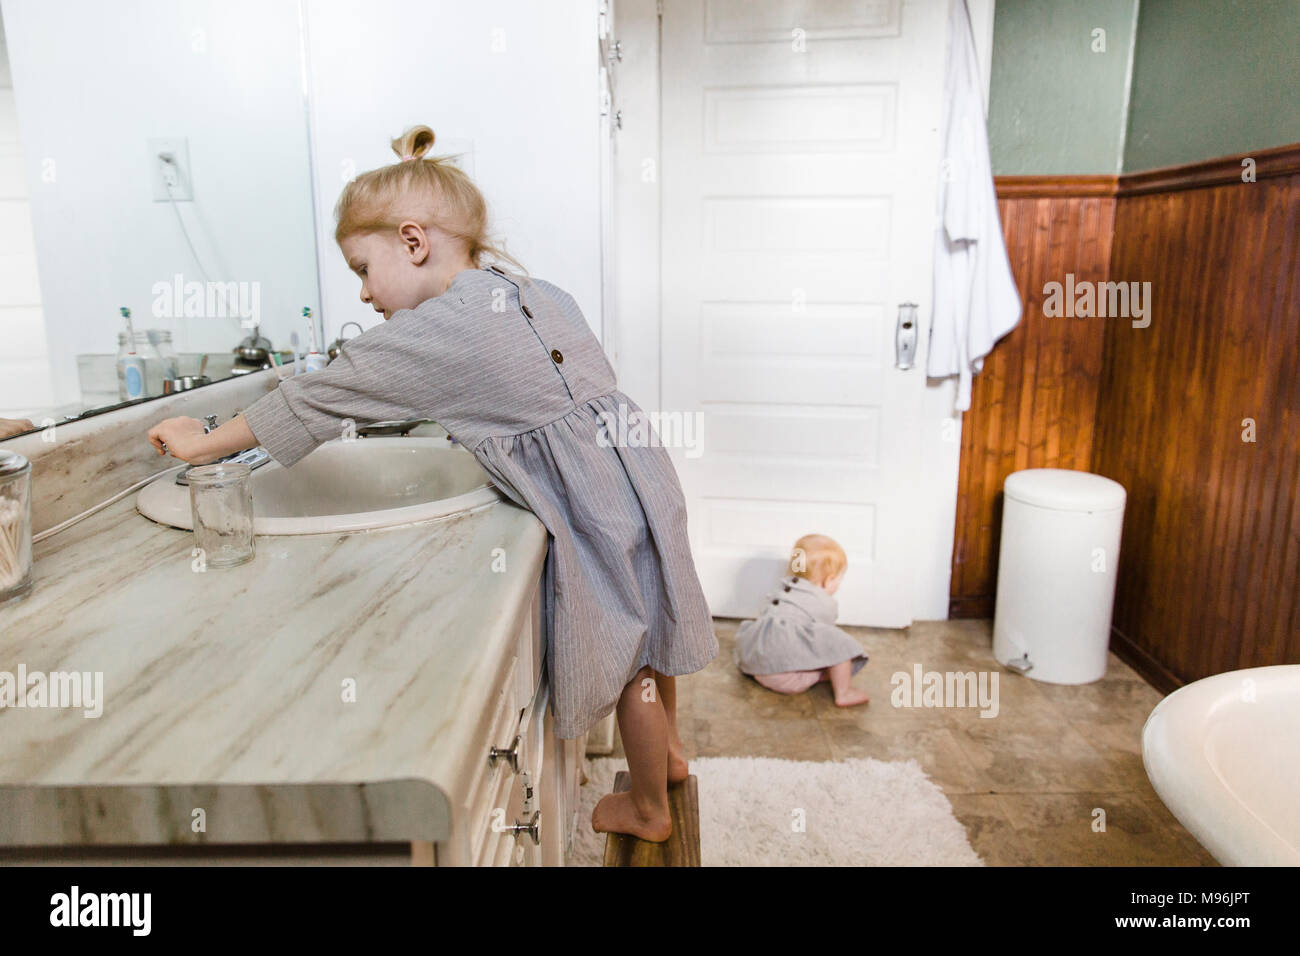 Girl using sink whilst baby sits on bathroom floor - Stock Image